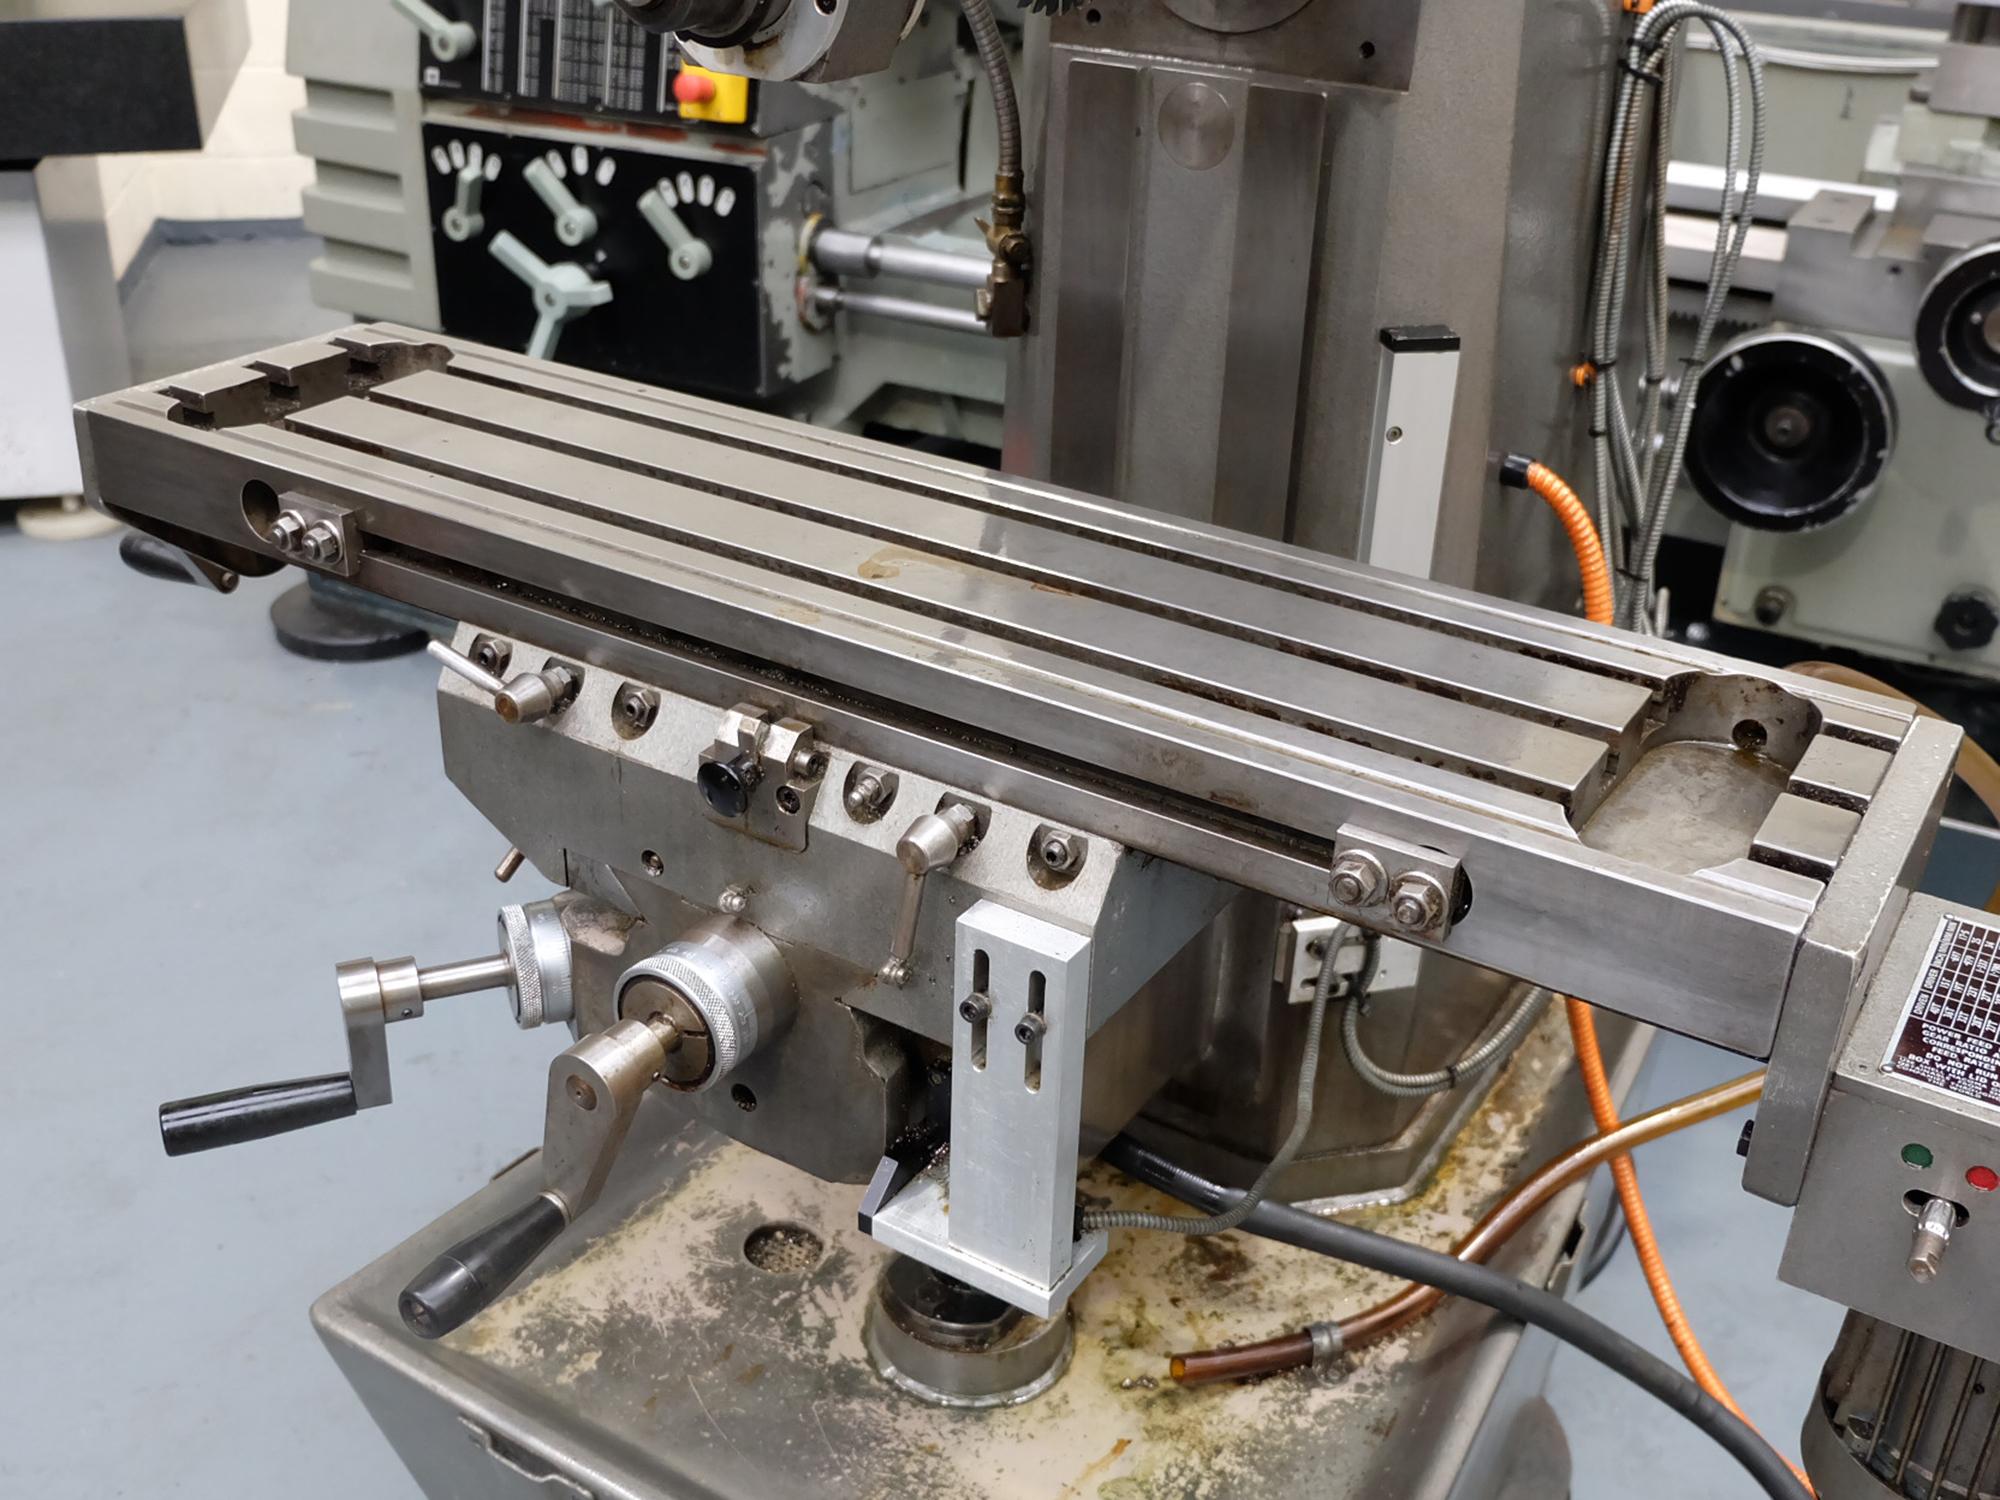 Veceroy AEW: Horizontal Milling Machine. - Image 4 of 10